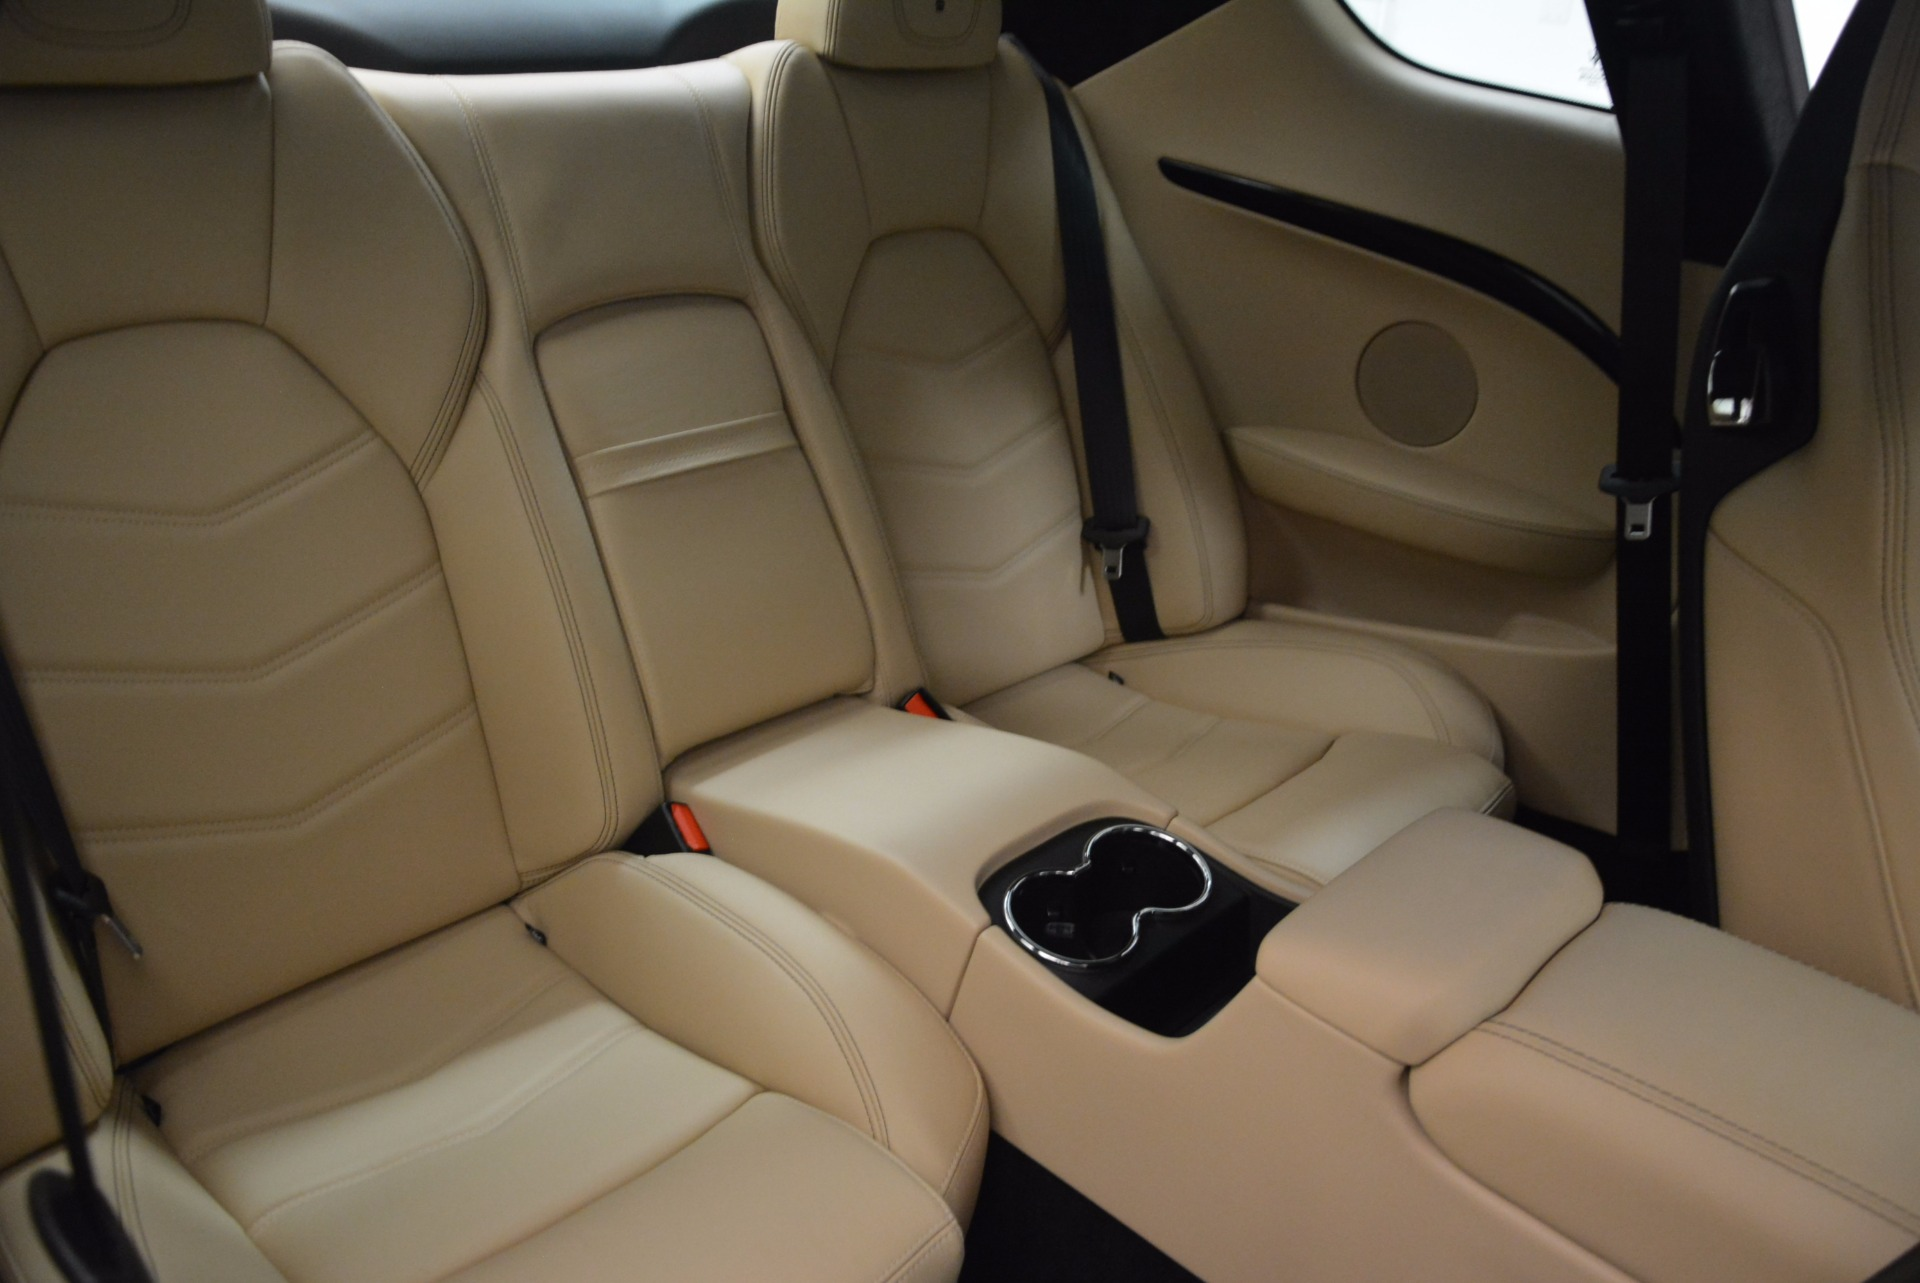 Used 2015 Maserati GranTurismo Sport Coupe For Sale In Westport, CT 1557_p25